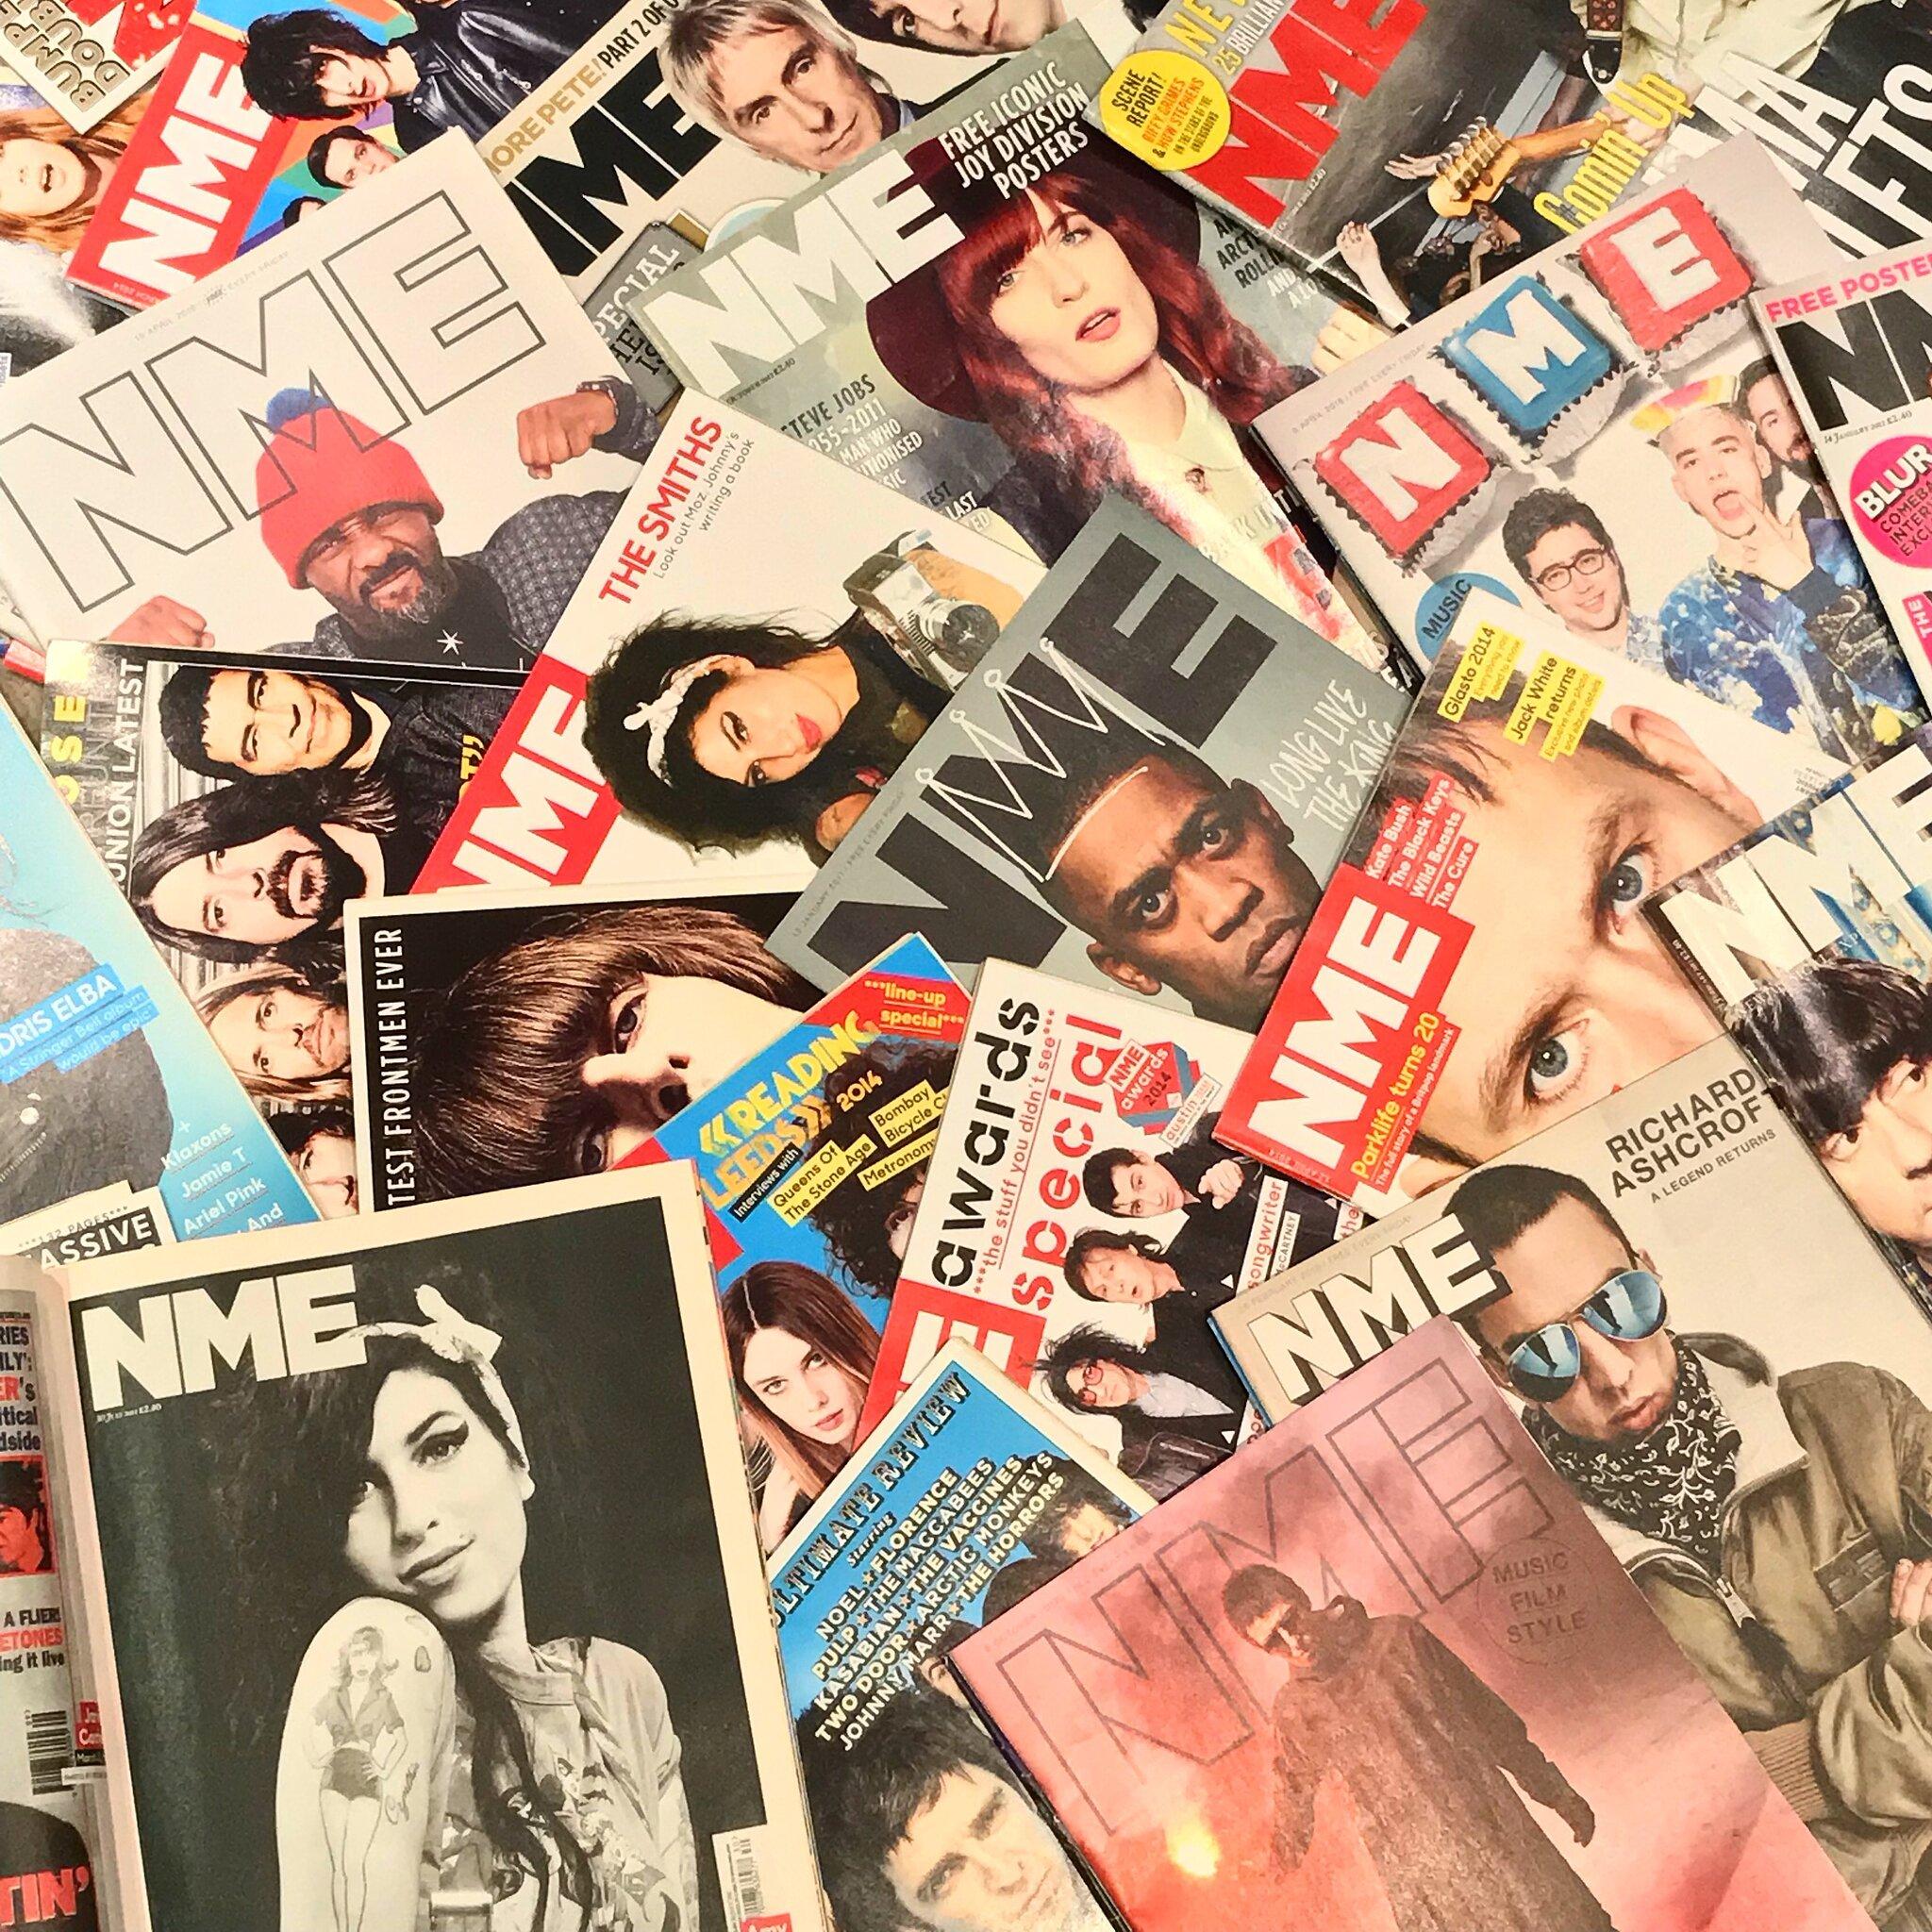 NME: Print Edition Closes